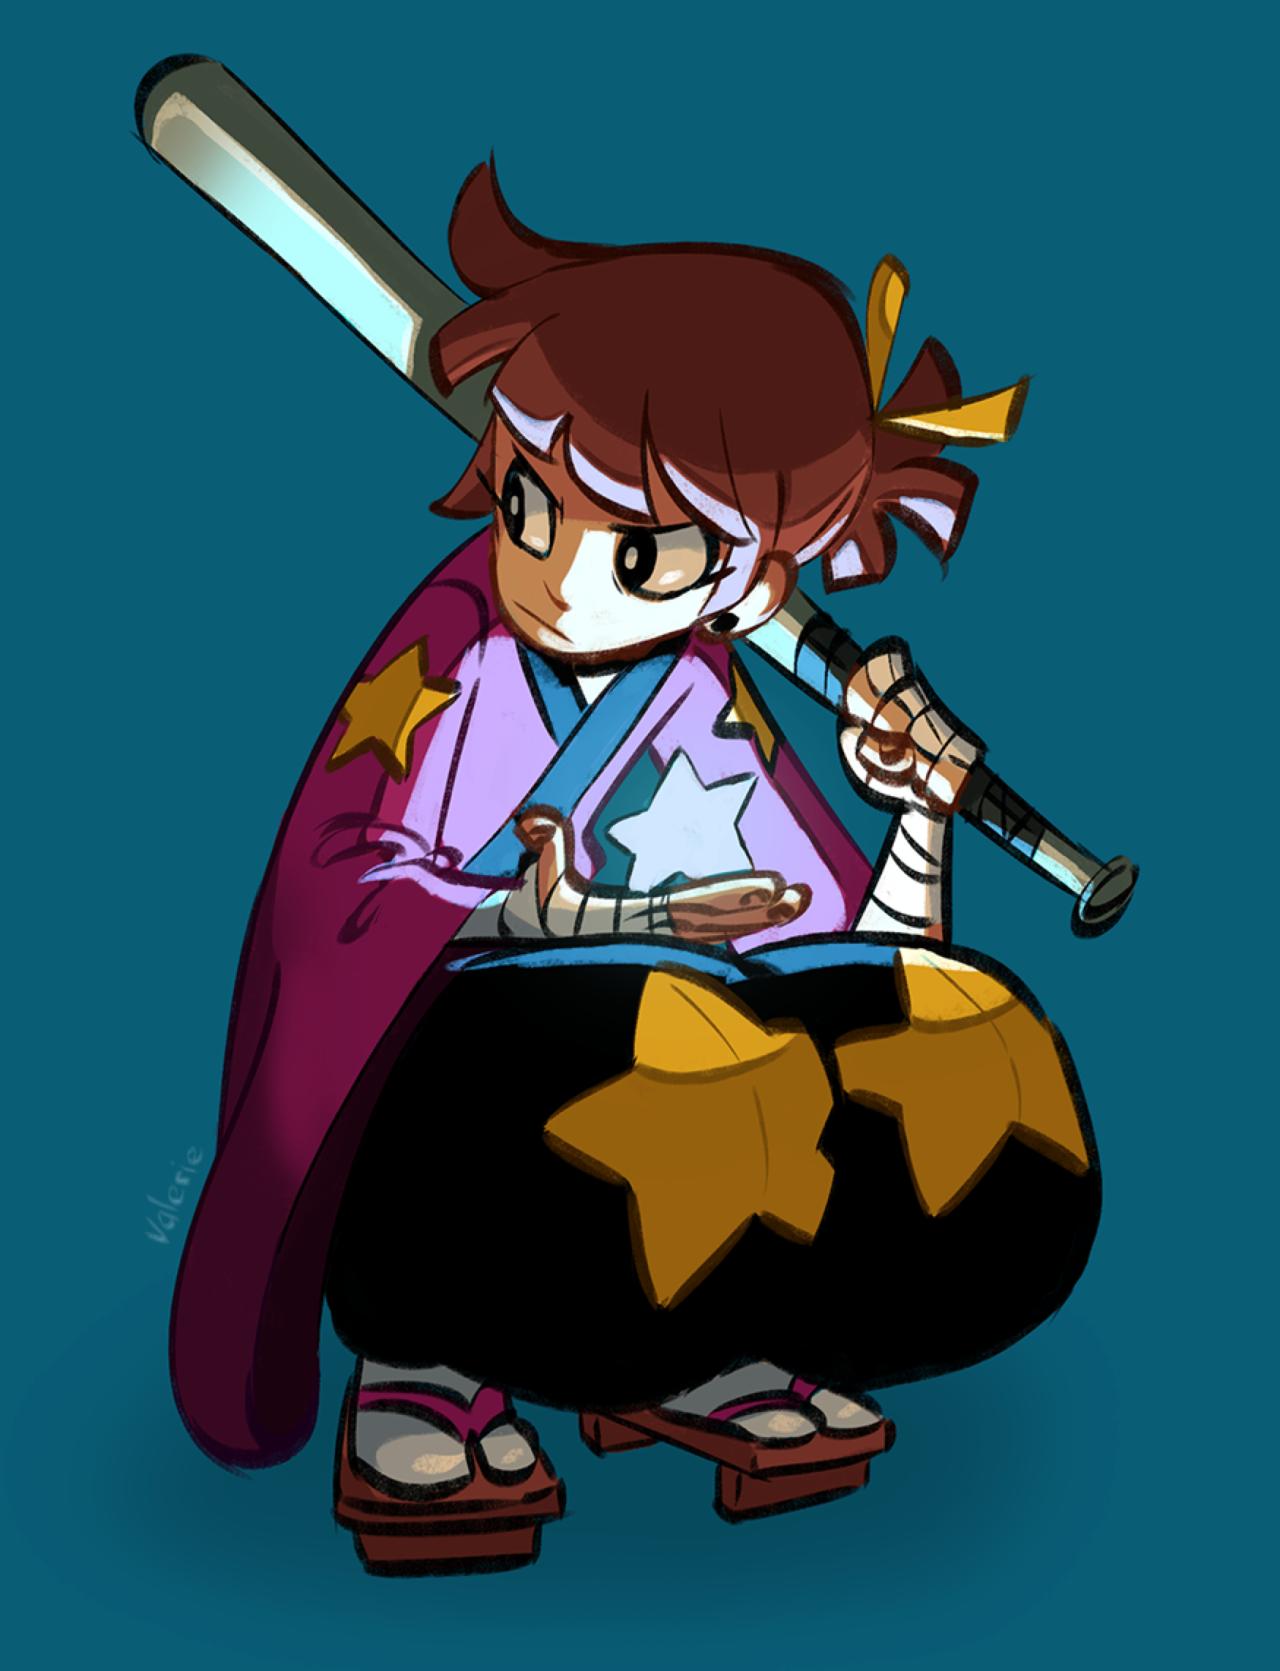 Did That Magical Girl Generator Thing Magical Girl Valerie Theme Samurai Motif Star Weapon Baseball Ba Character Design Magical Girl Concept Art Characters